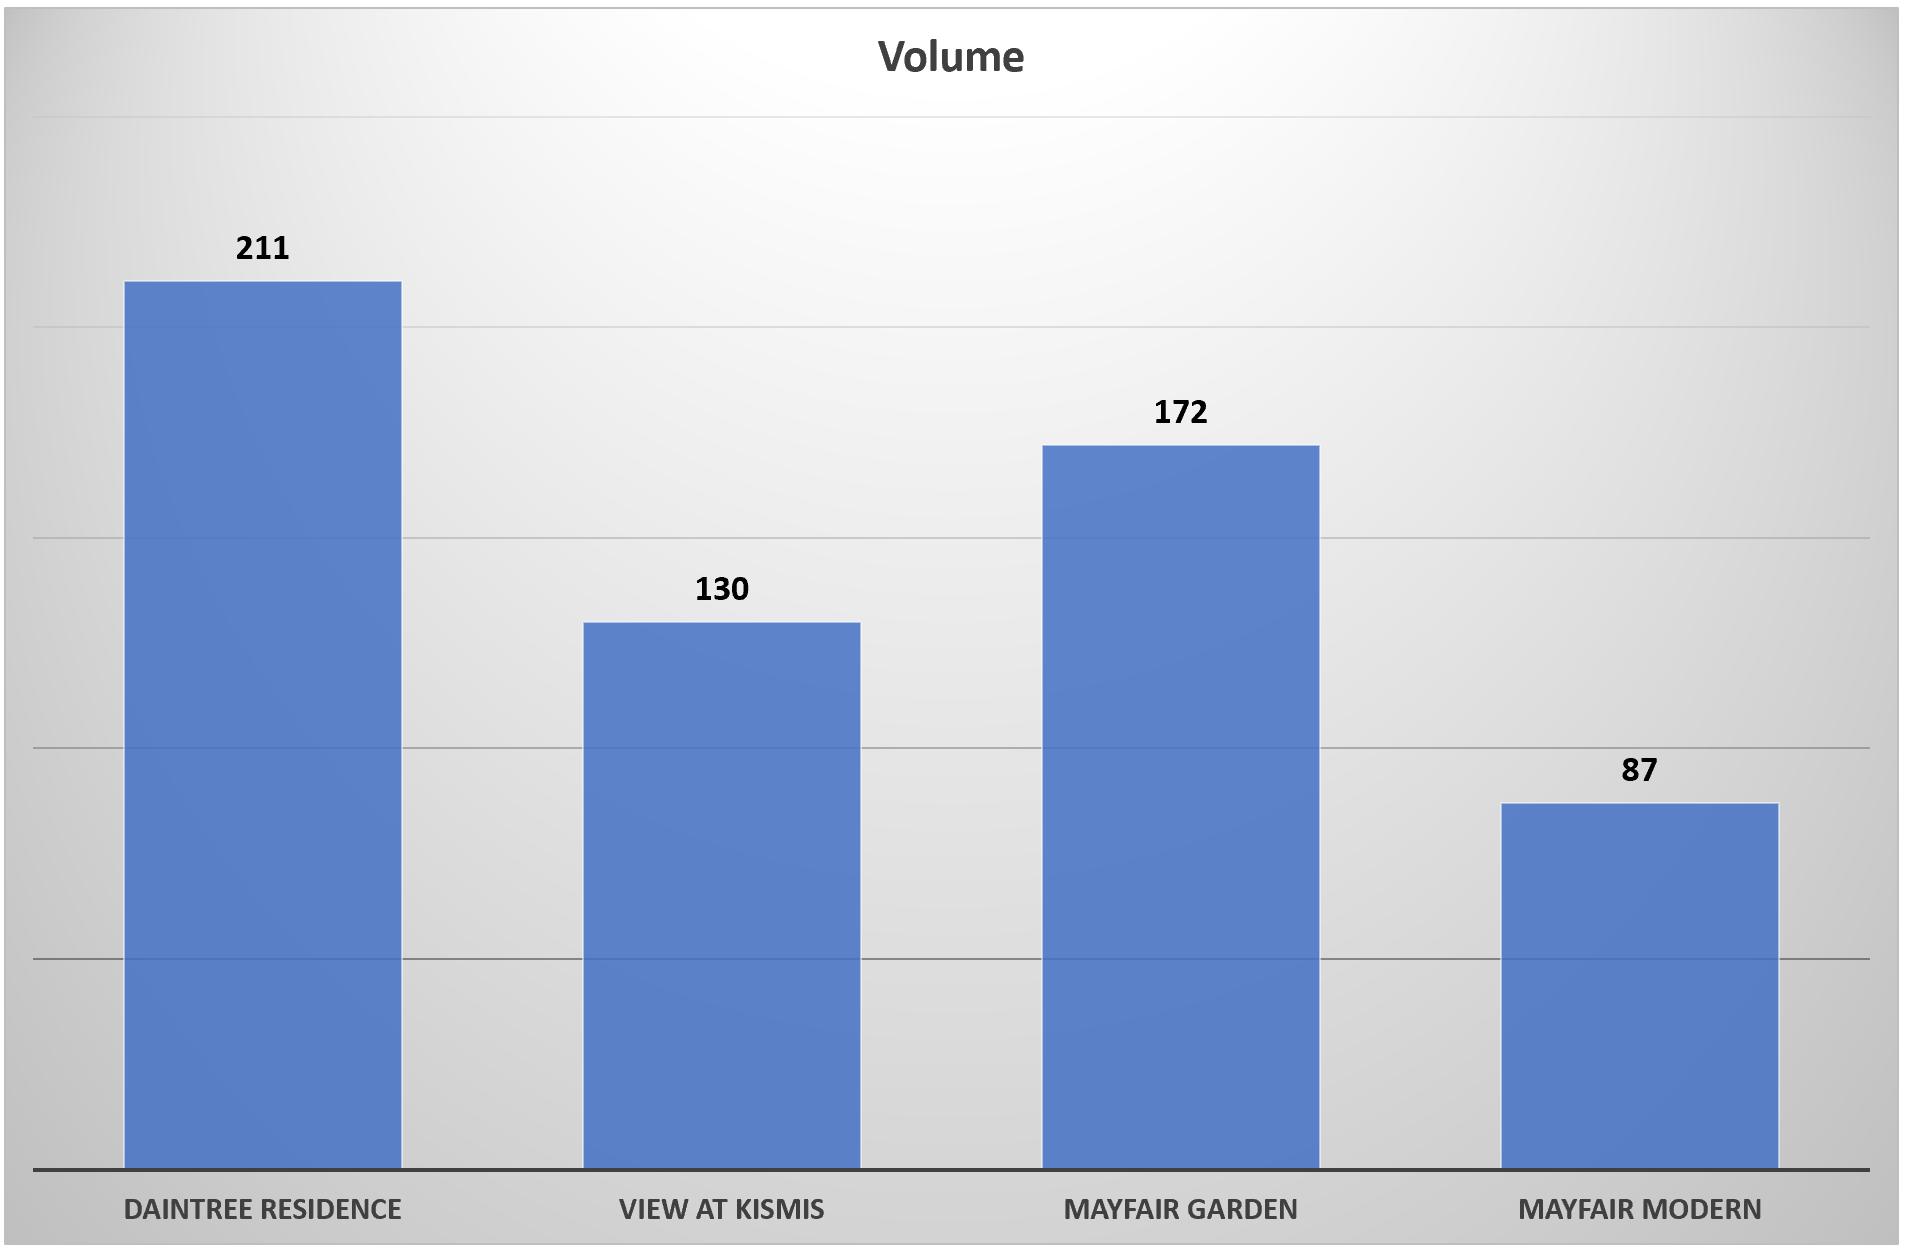 Transaction Volume of Daintree Residence